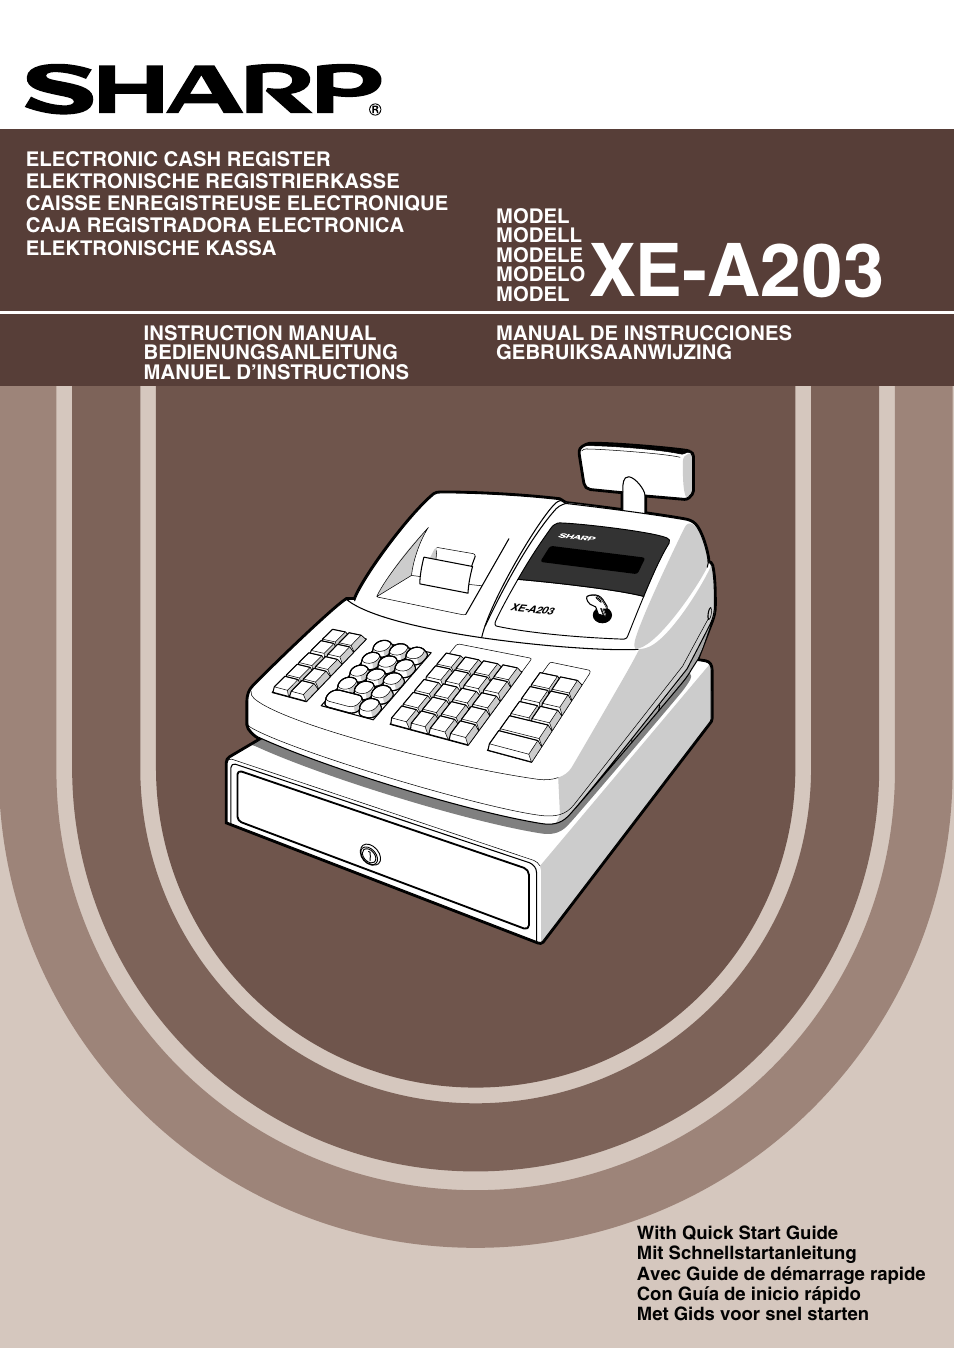 sharp xe a203 user manual 454 pages original mode rh manualsdir com sharp xe-a203 service manual sharp xe-a203 instruction manual